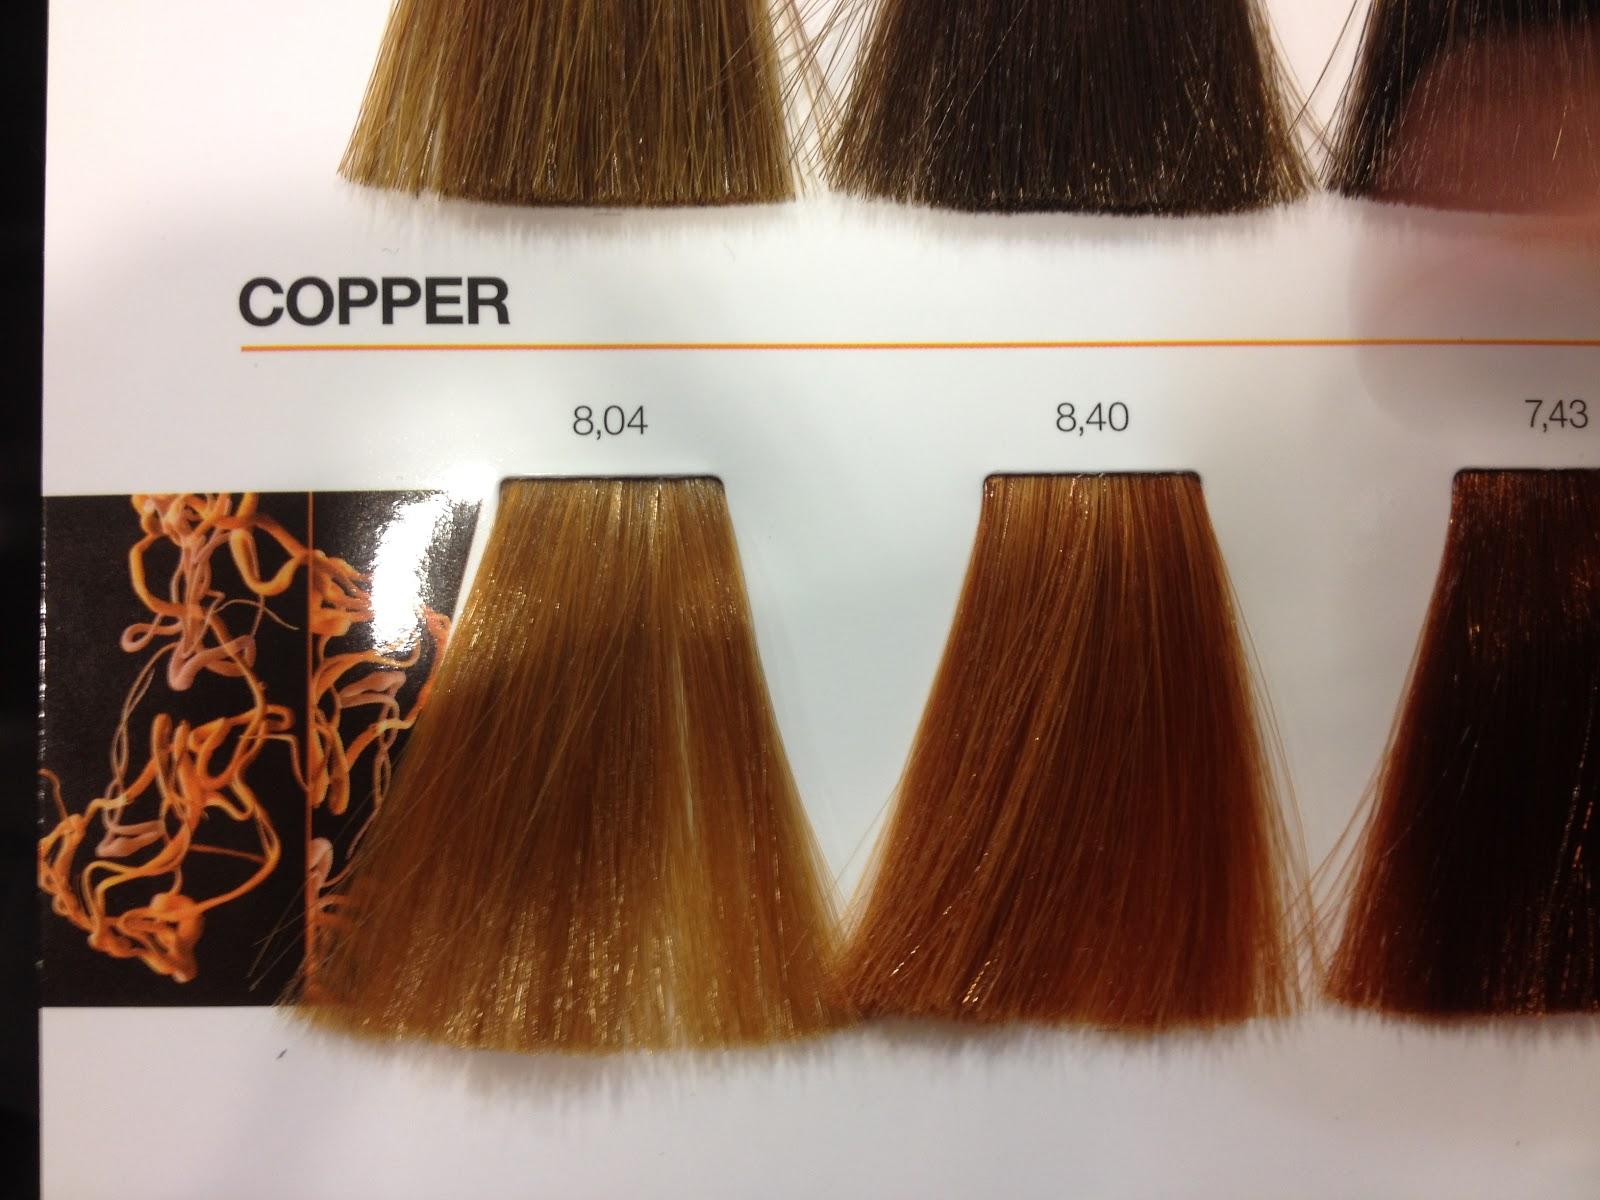 Capitec internet banking review inoa loreal hair color at rush review inoa loreal hair color at rush kensington nvjuhfo Images